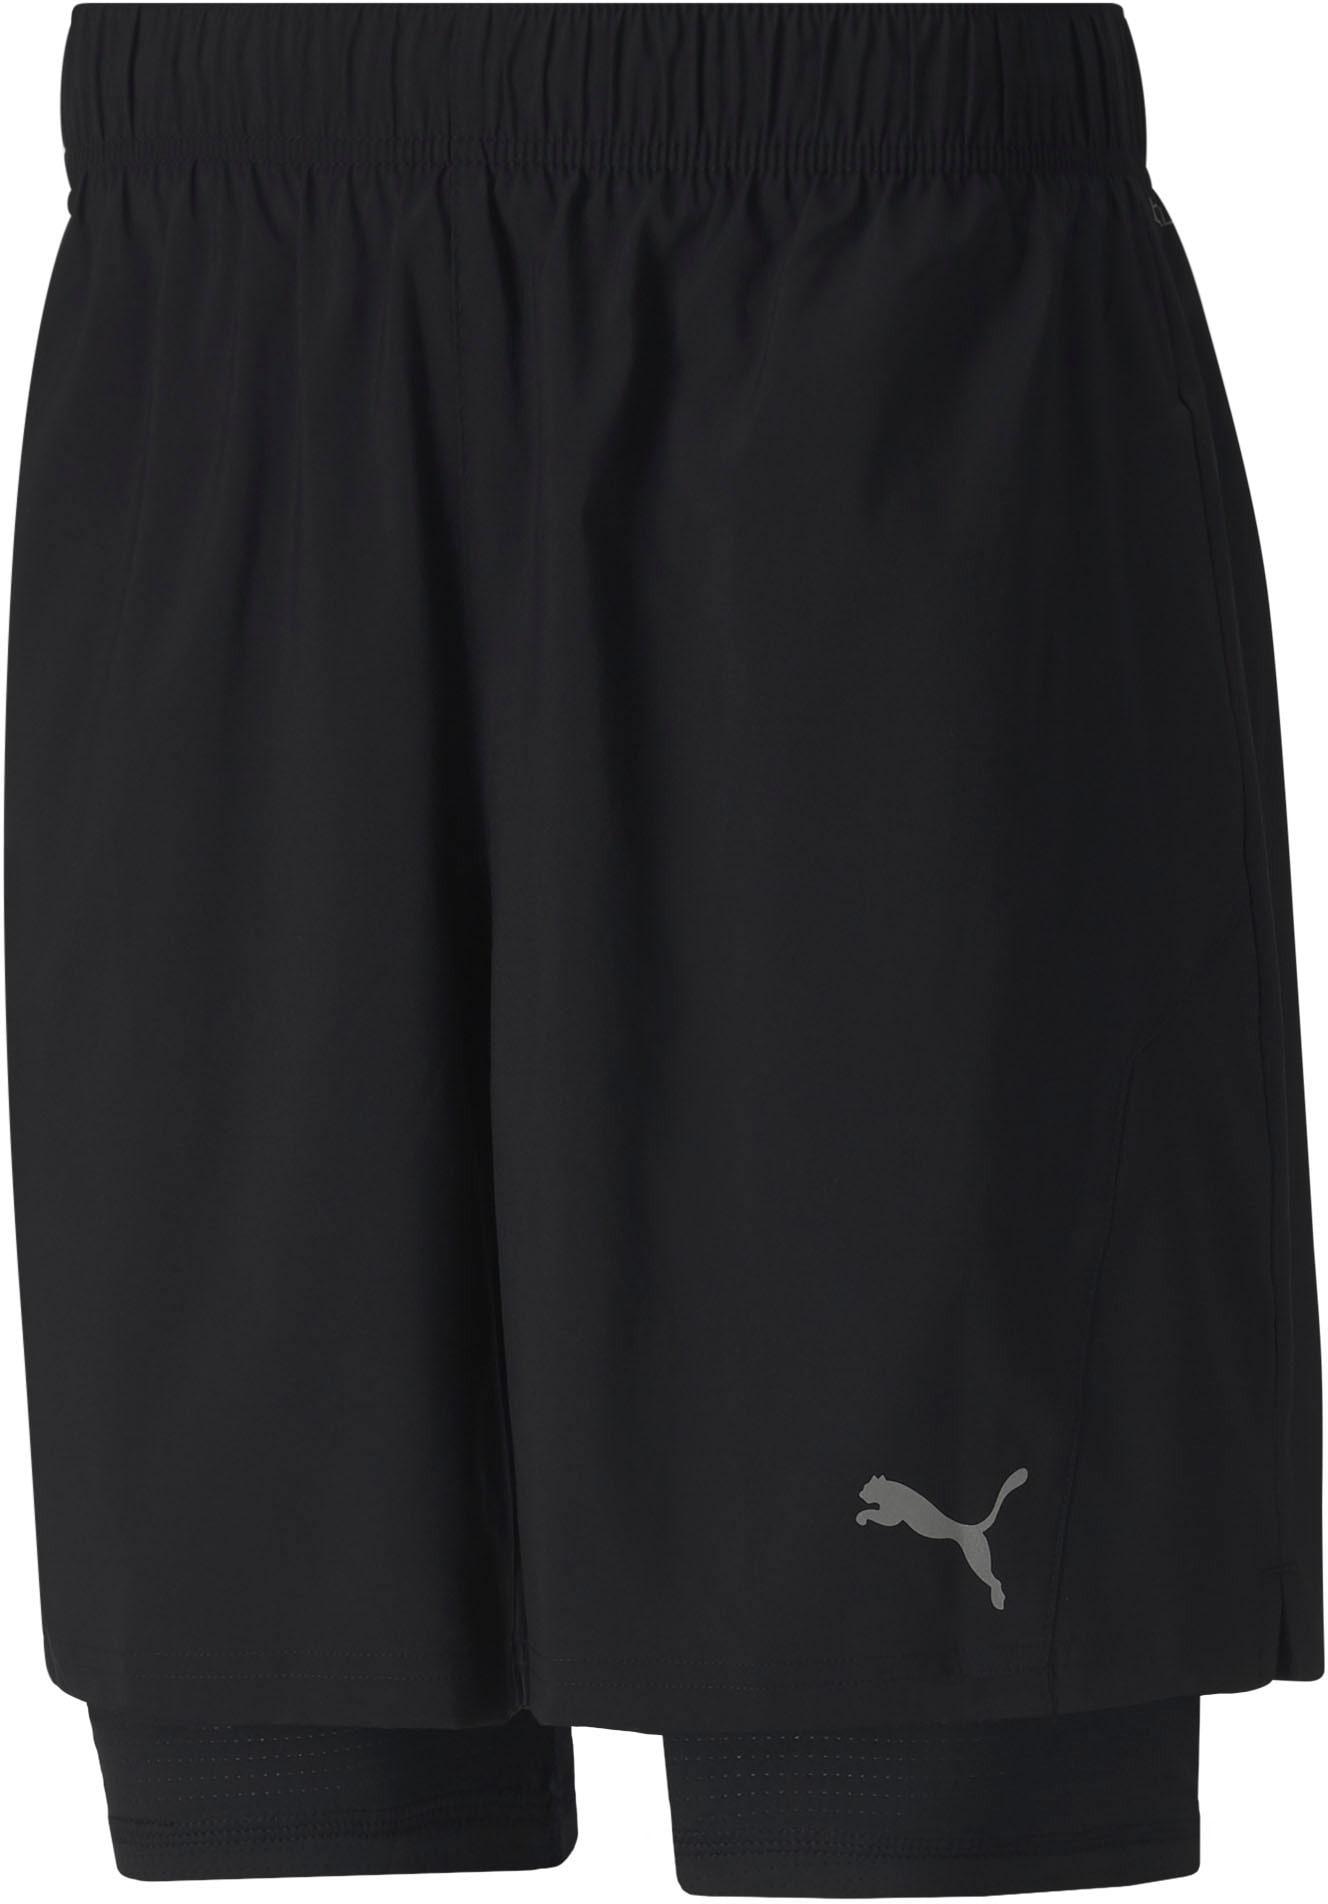 PUMA Trainingsshorts Run Favorite Woven 2in1 7 Short schwarz